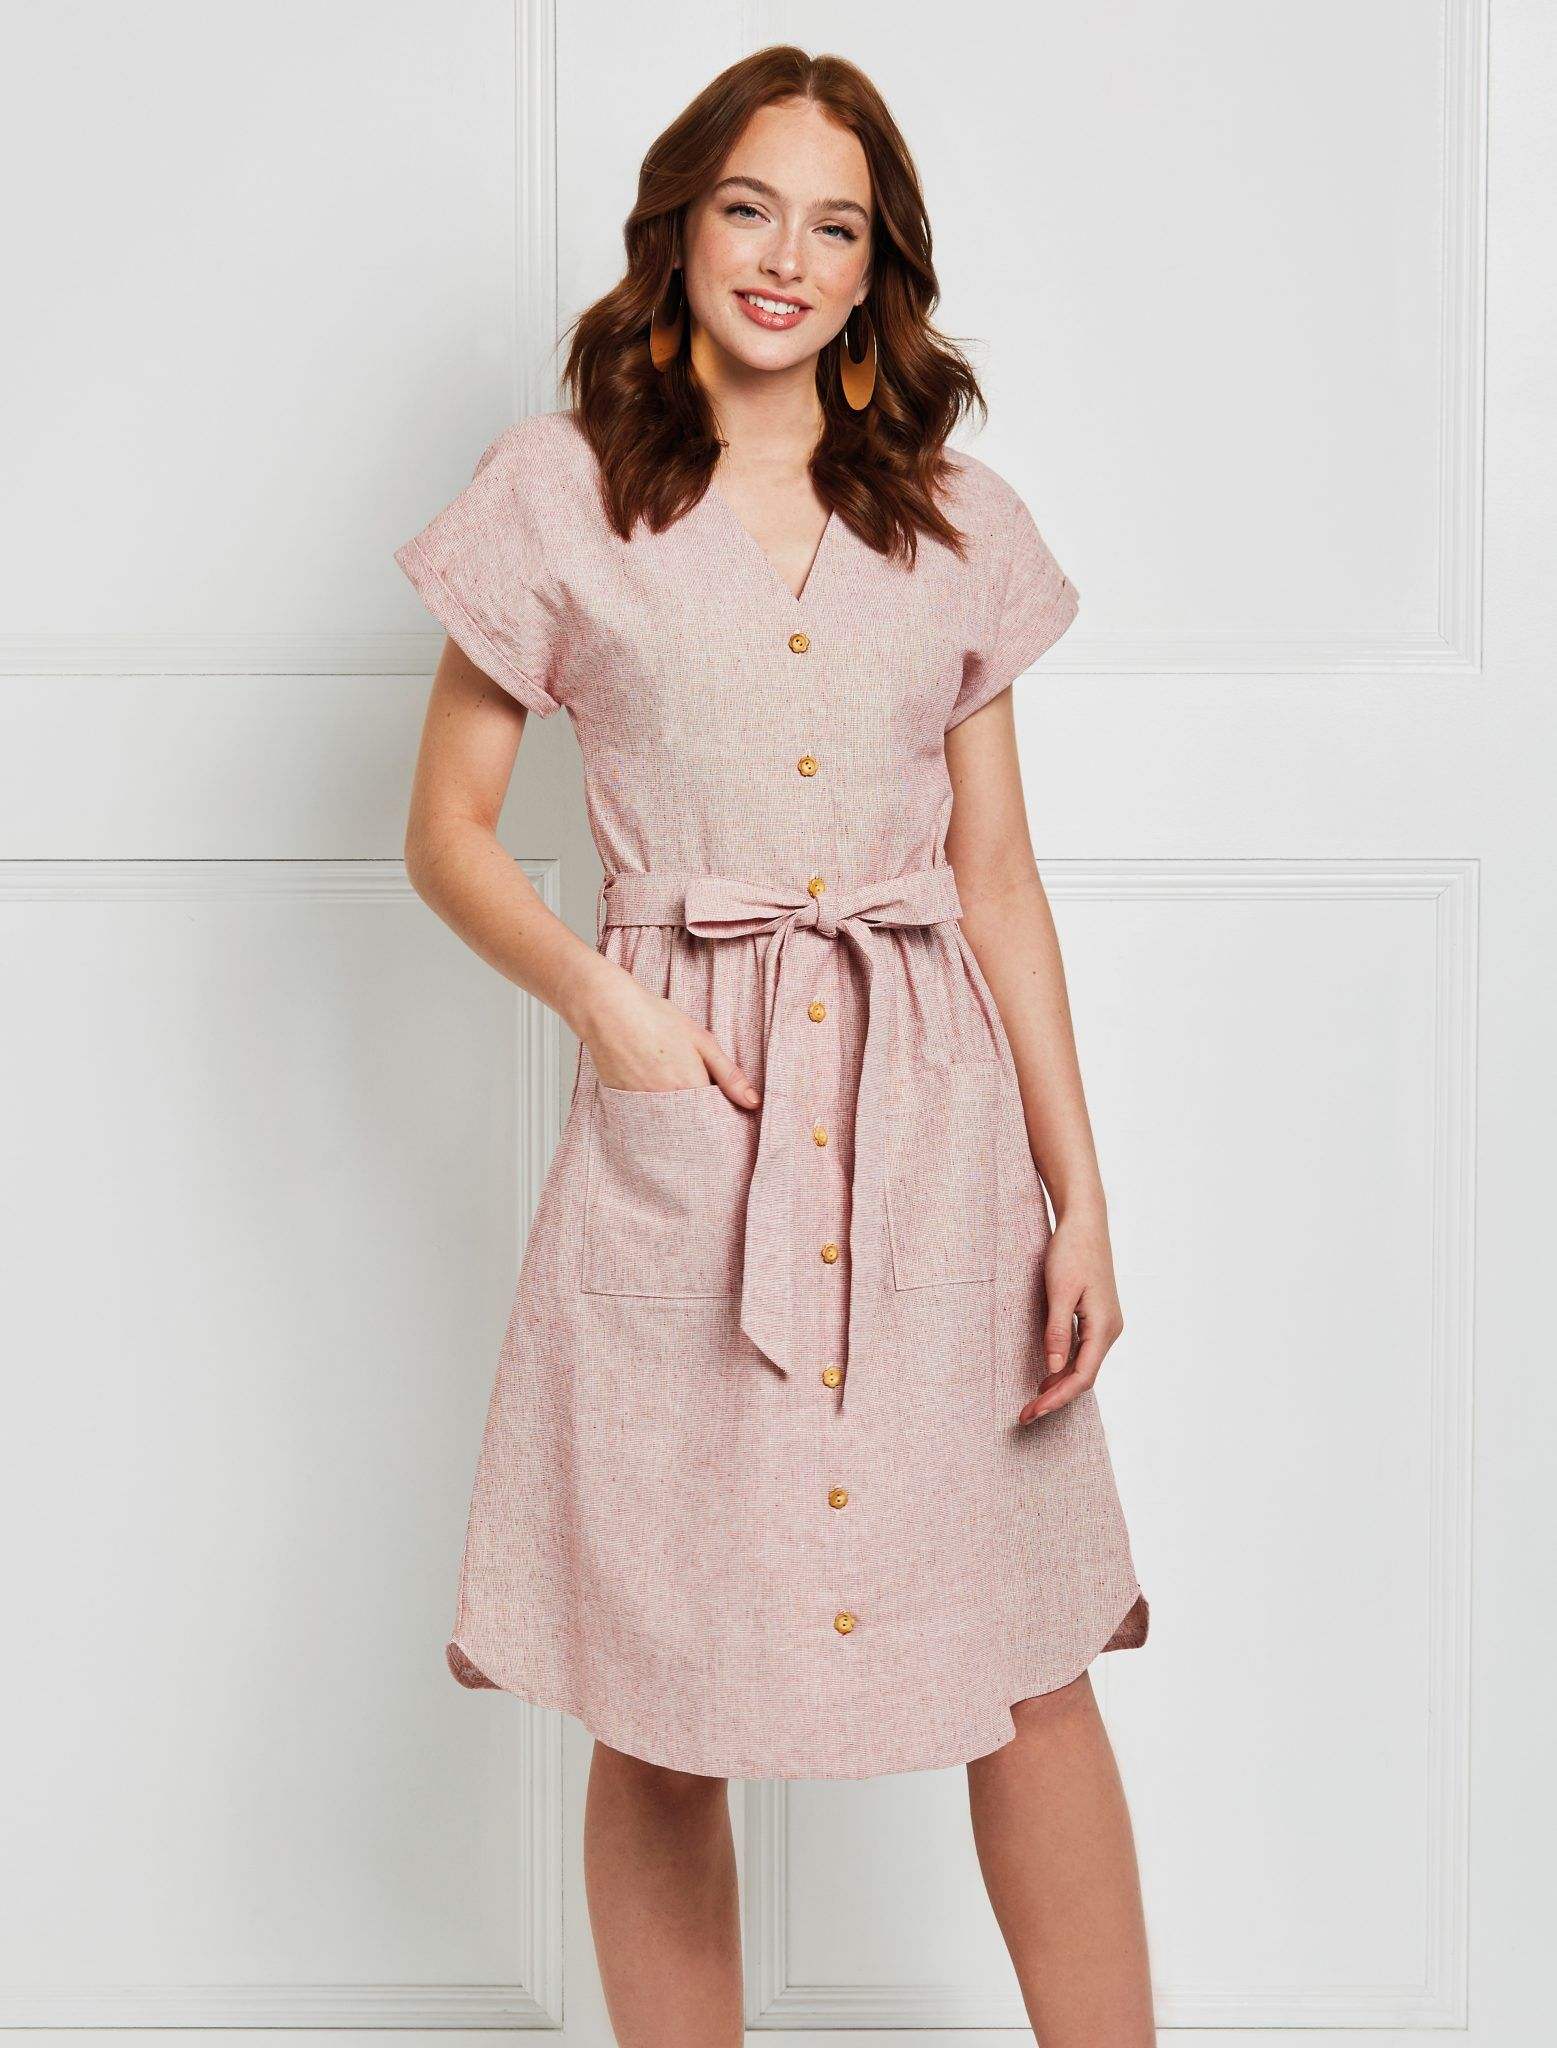 18++ Button front dress ideas